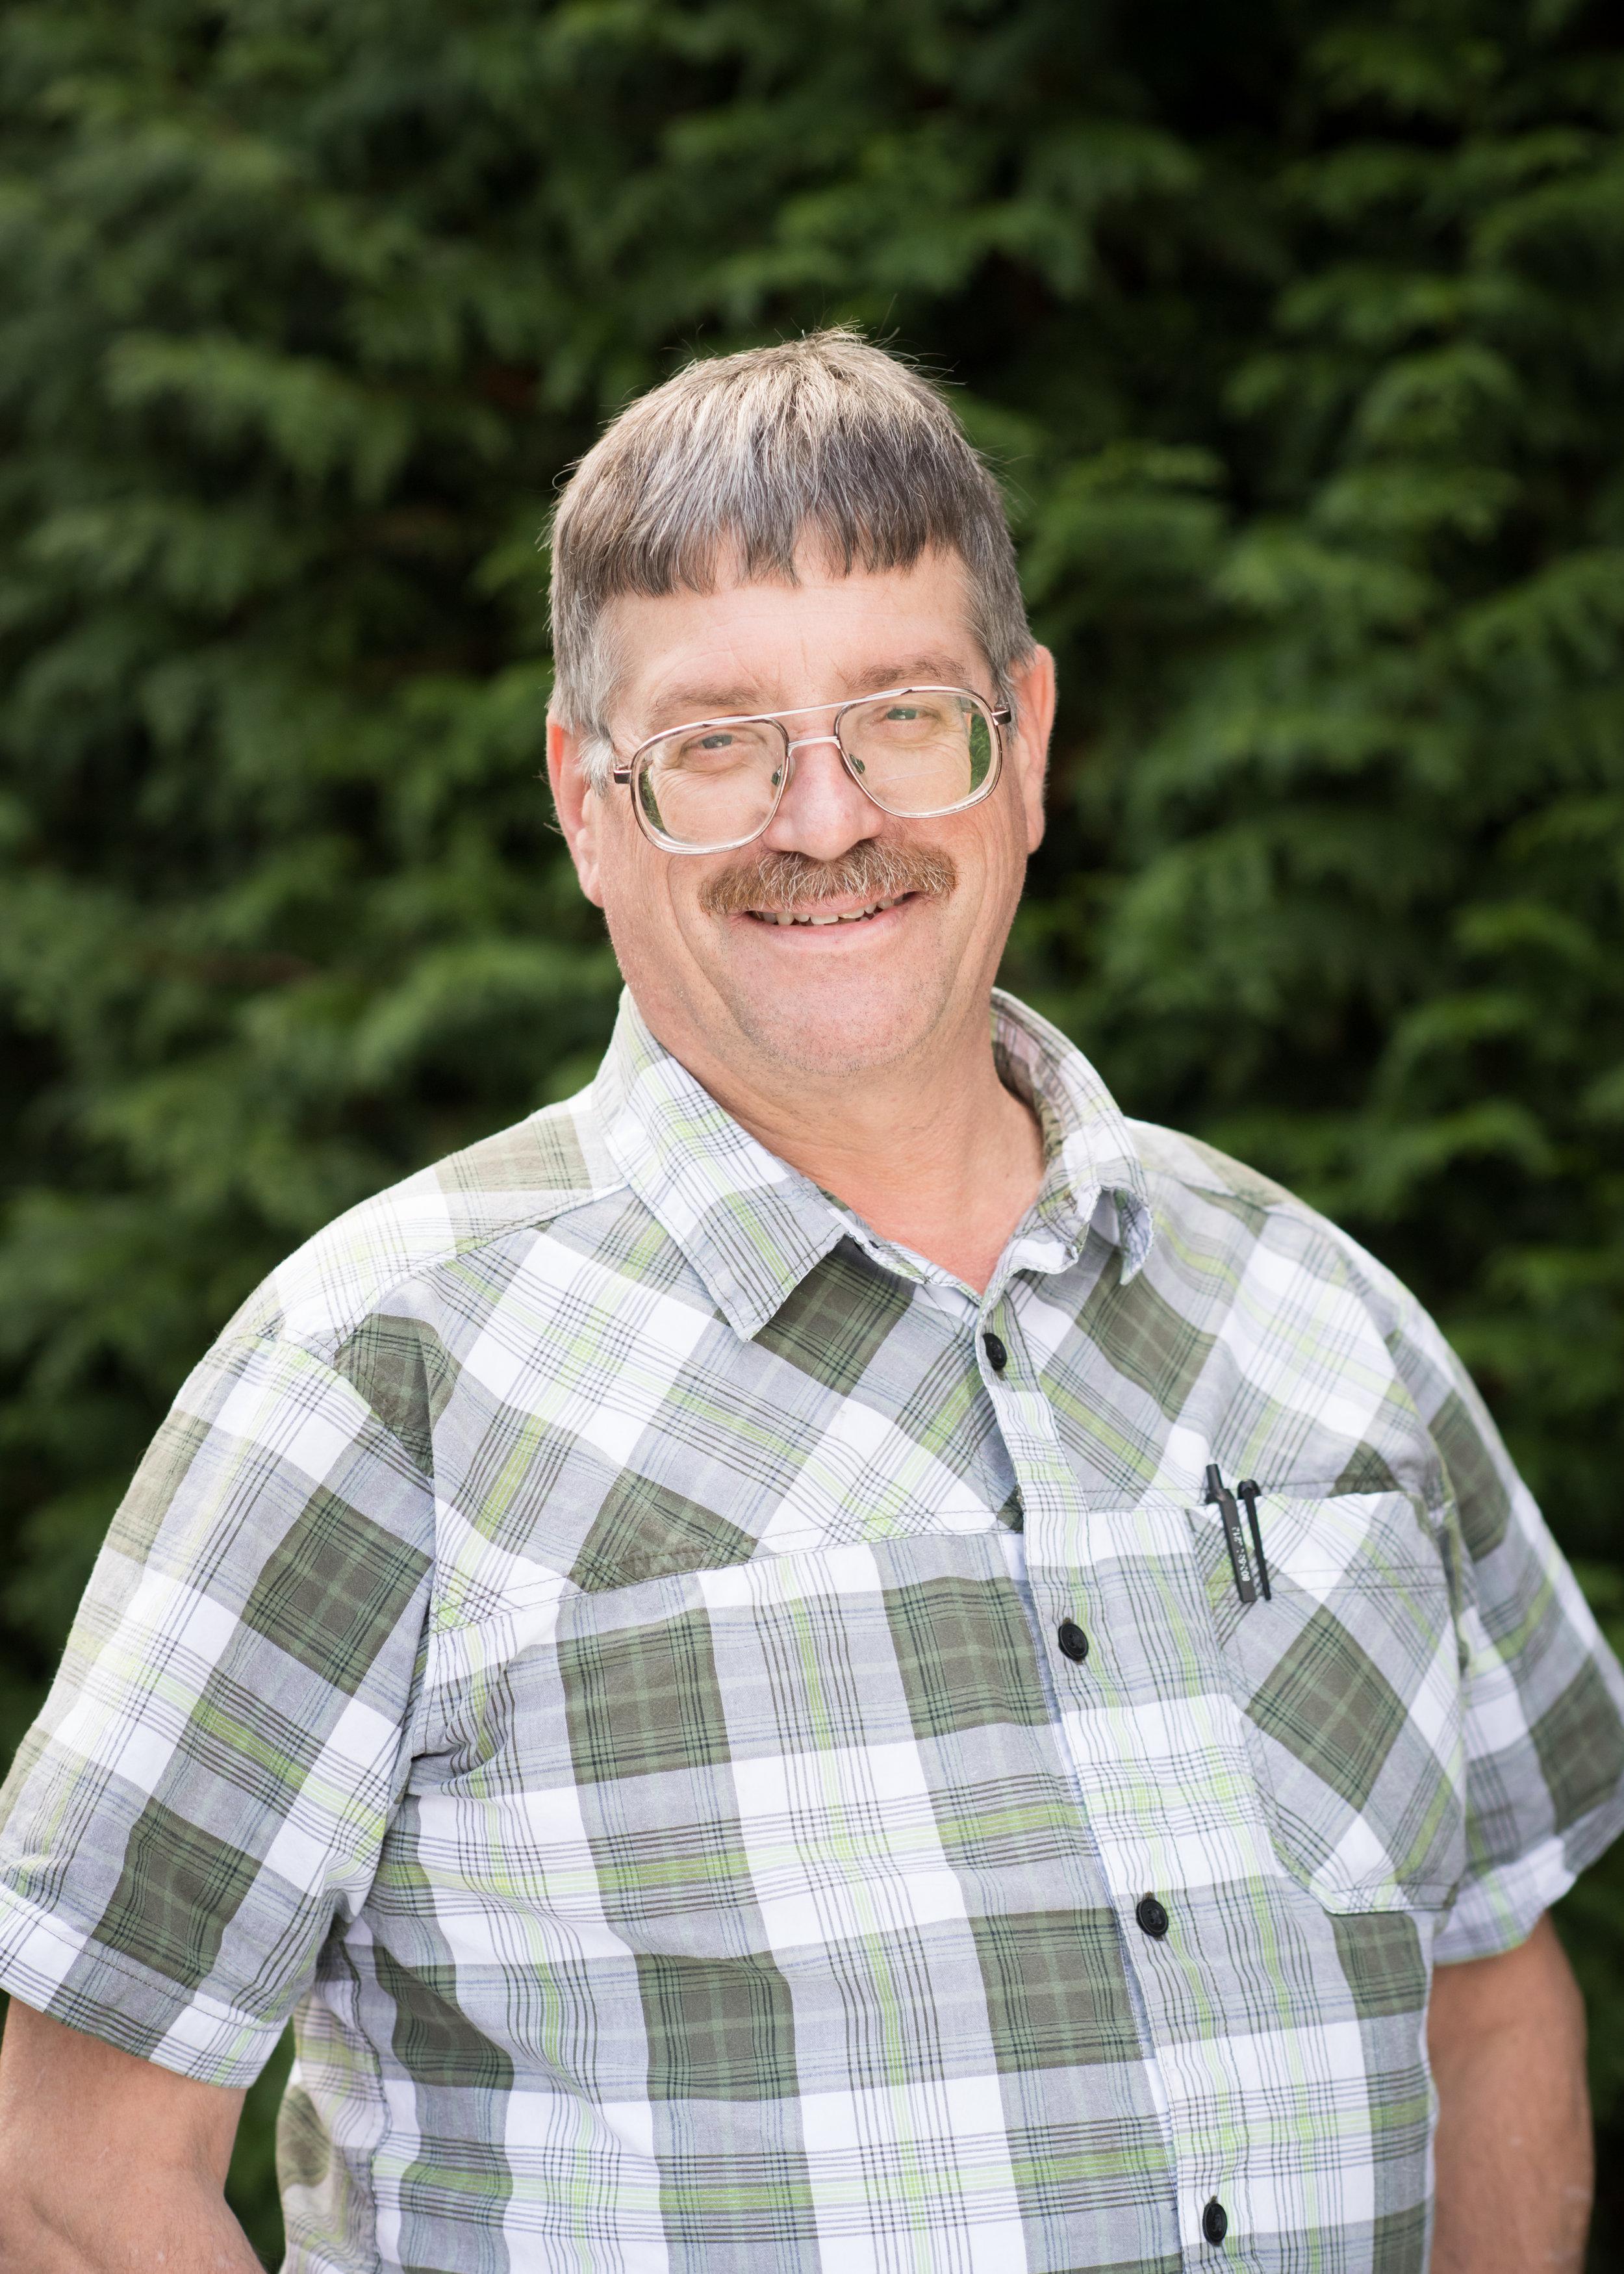 Dave Brandenburg, Maintenance Supervisor